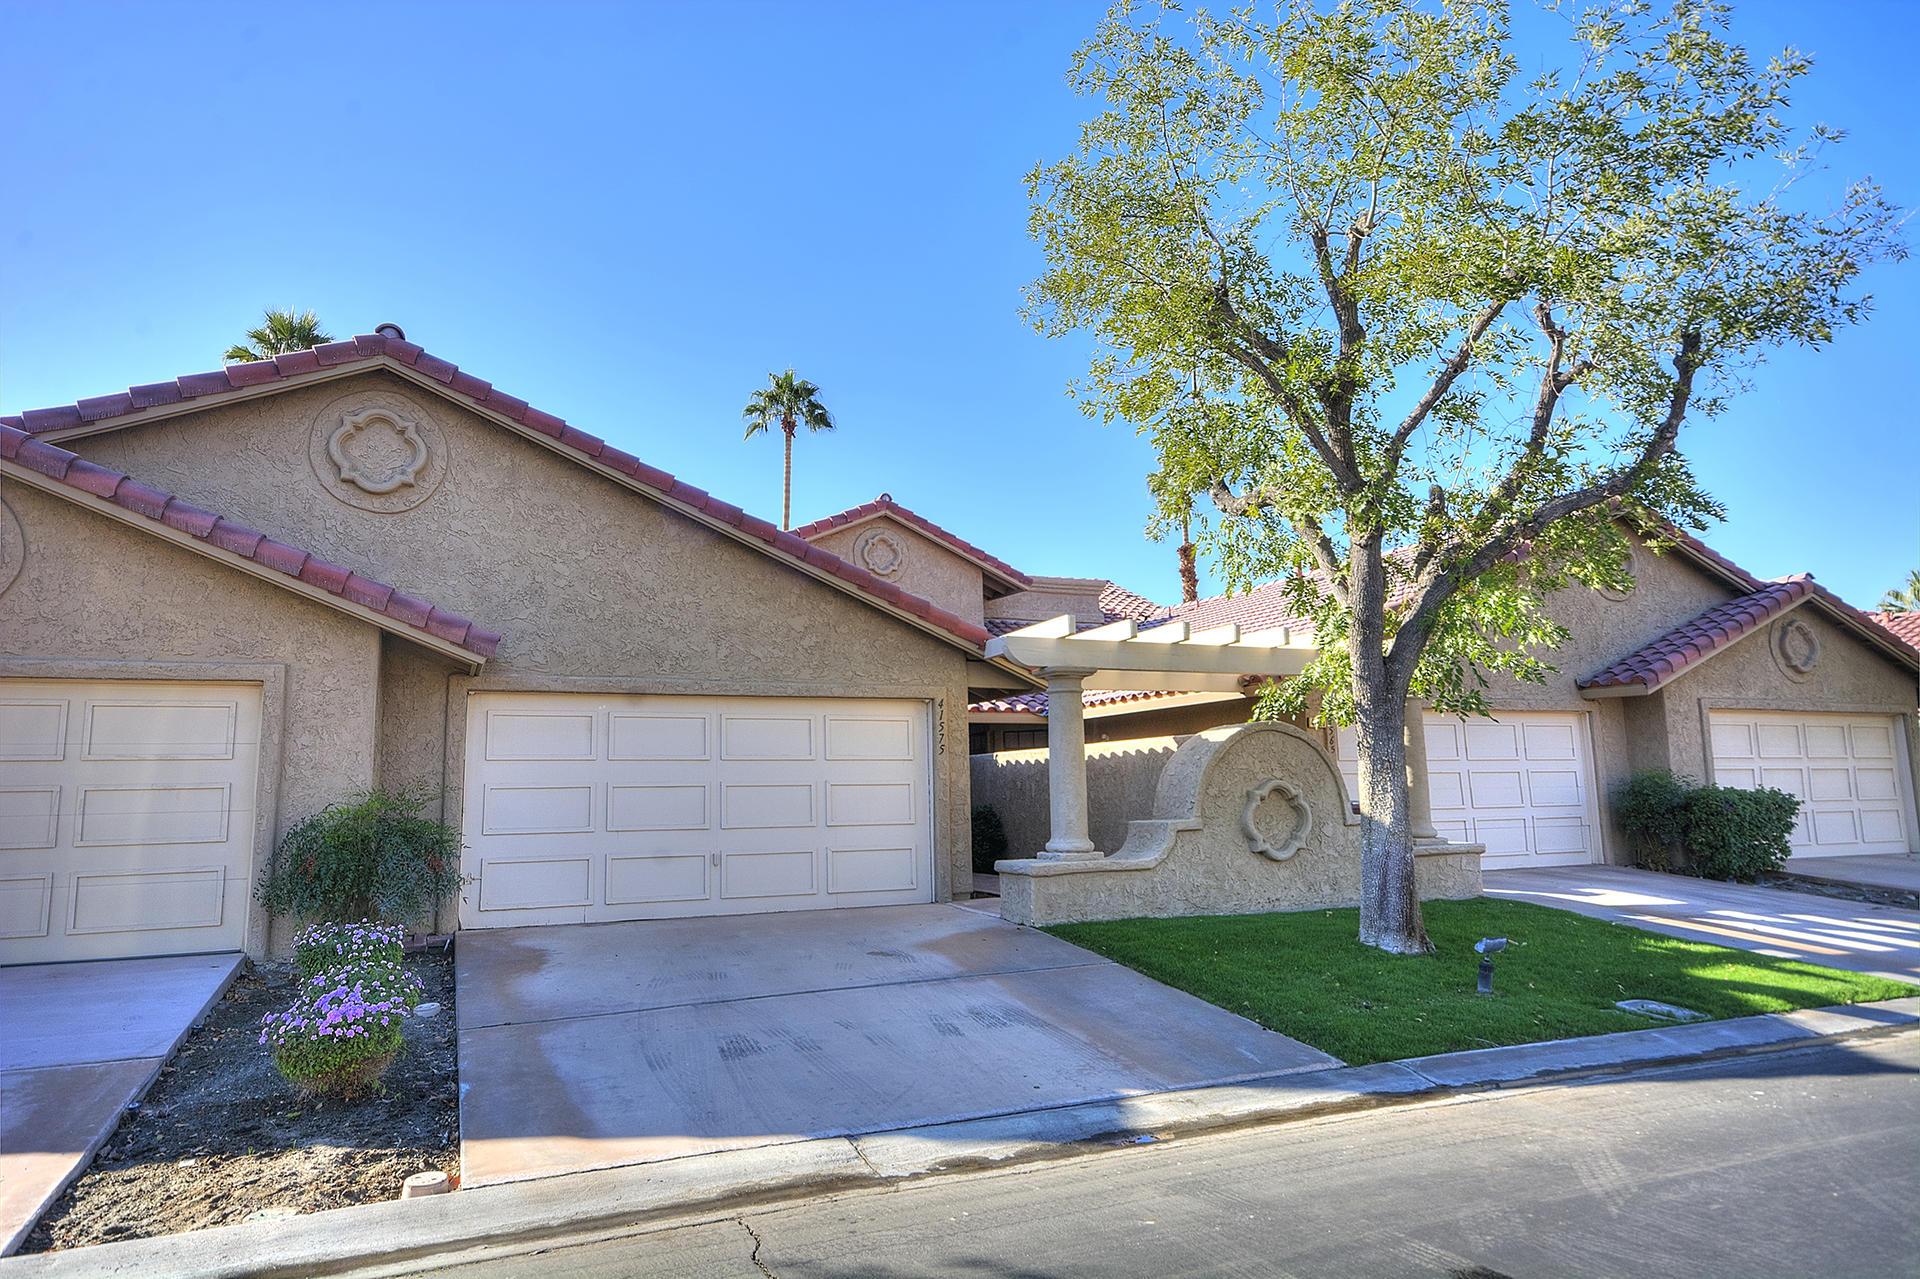 Photo of 41575 Woodhaven Drive, Palm Desert, CA 92211